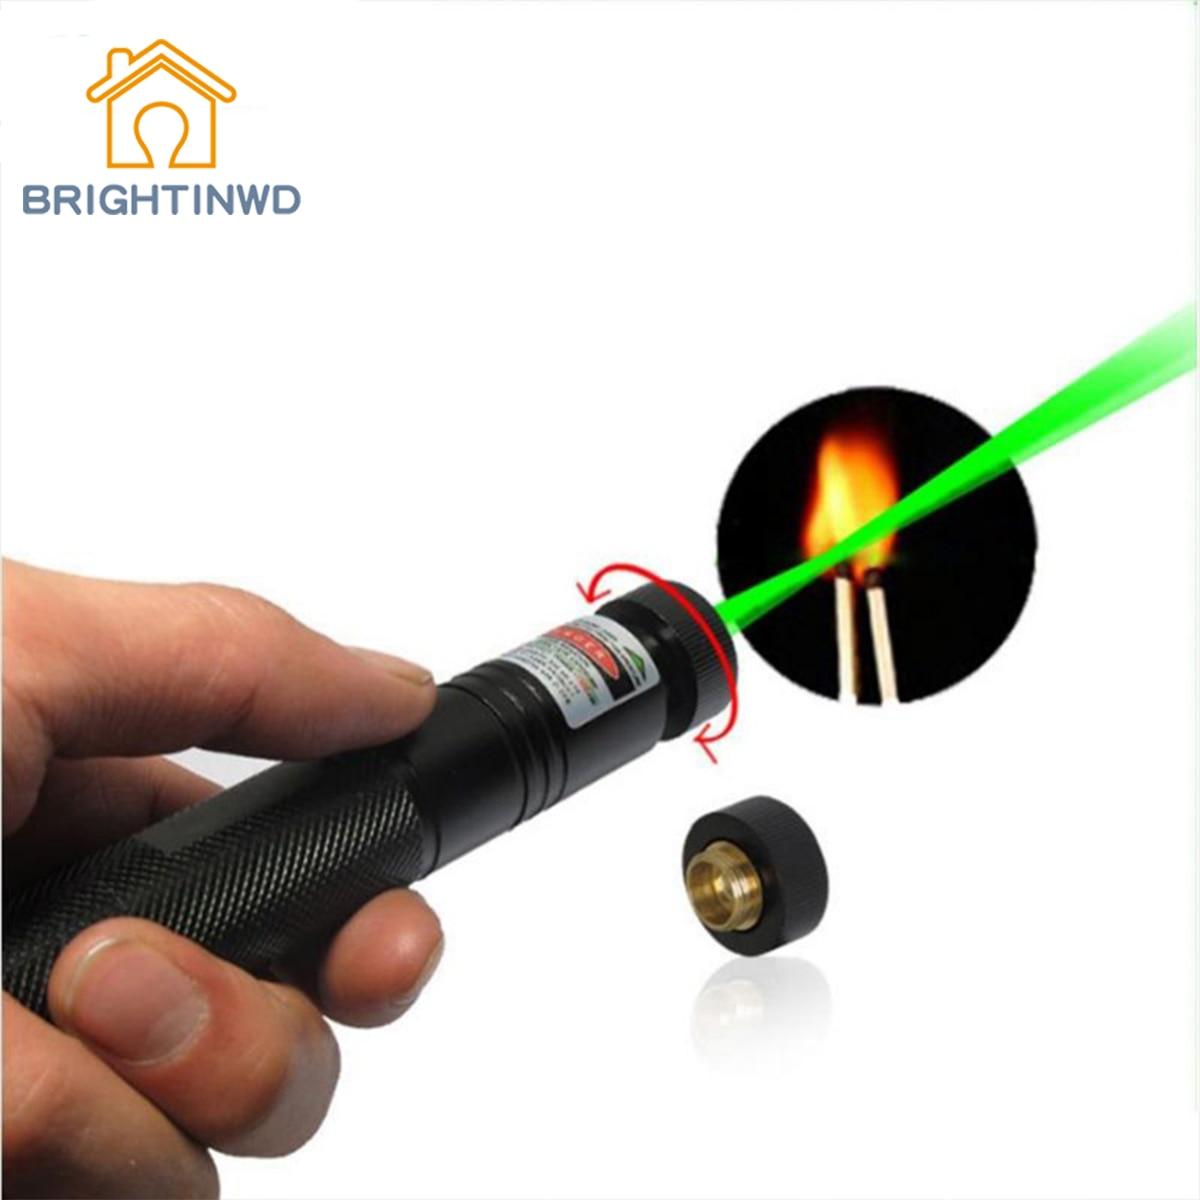 BRIGHTINWD Green Laser Pointer High Power Strong Light Match Cigarette and Fire Lighter beam Laser Flashlight Torch